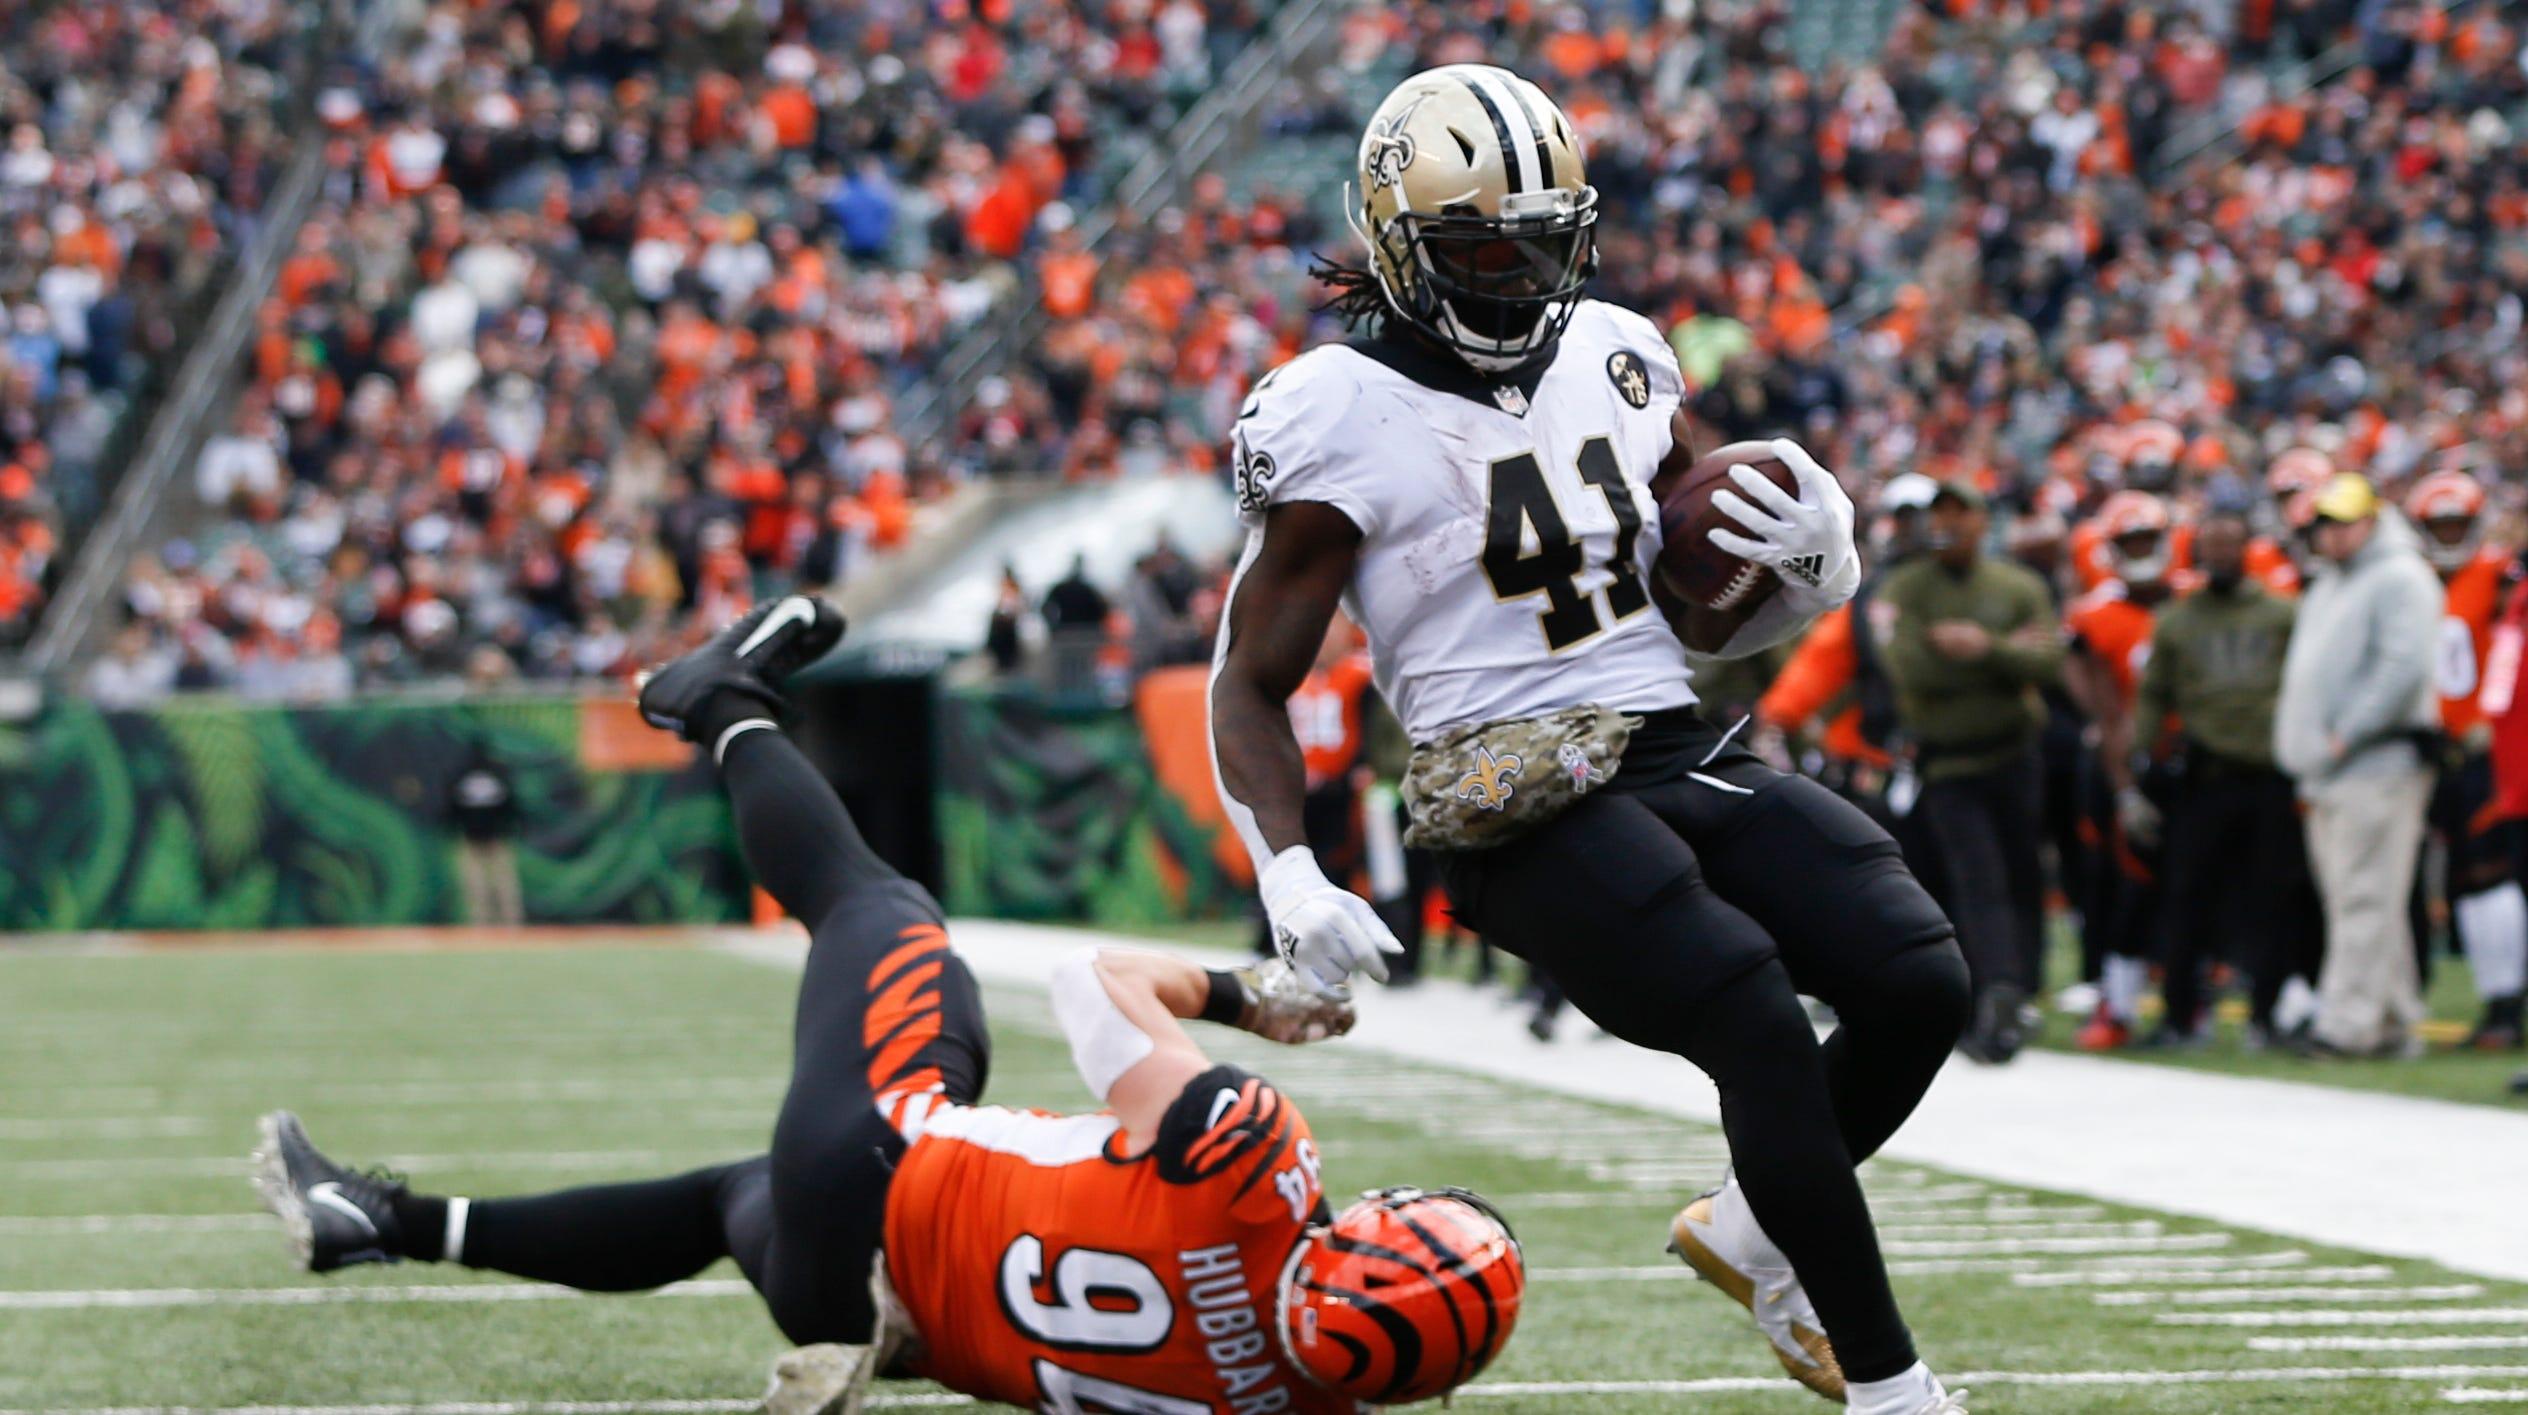 New Orleans Saints running back Alvin Kamara (41) runs in for a touchdown against Cincinnati Bengals defensive end Sam Hubbard (94) in the first half of an NFL football game, Sunday, Nov. 11, 2018, in Cincinnati.